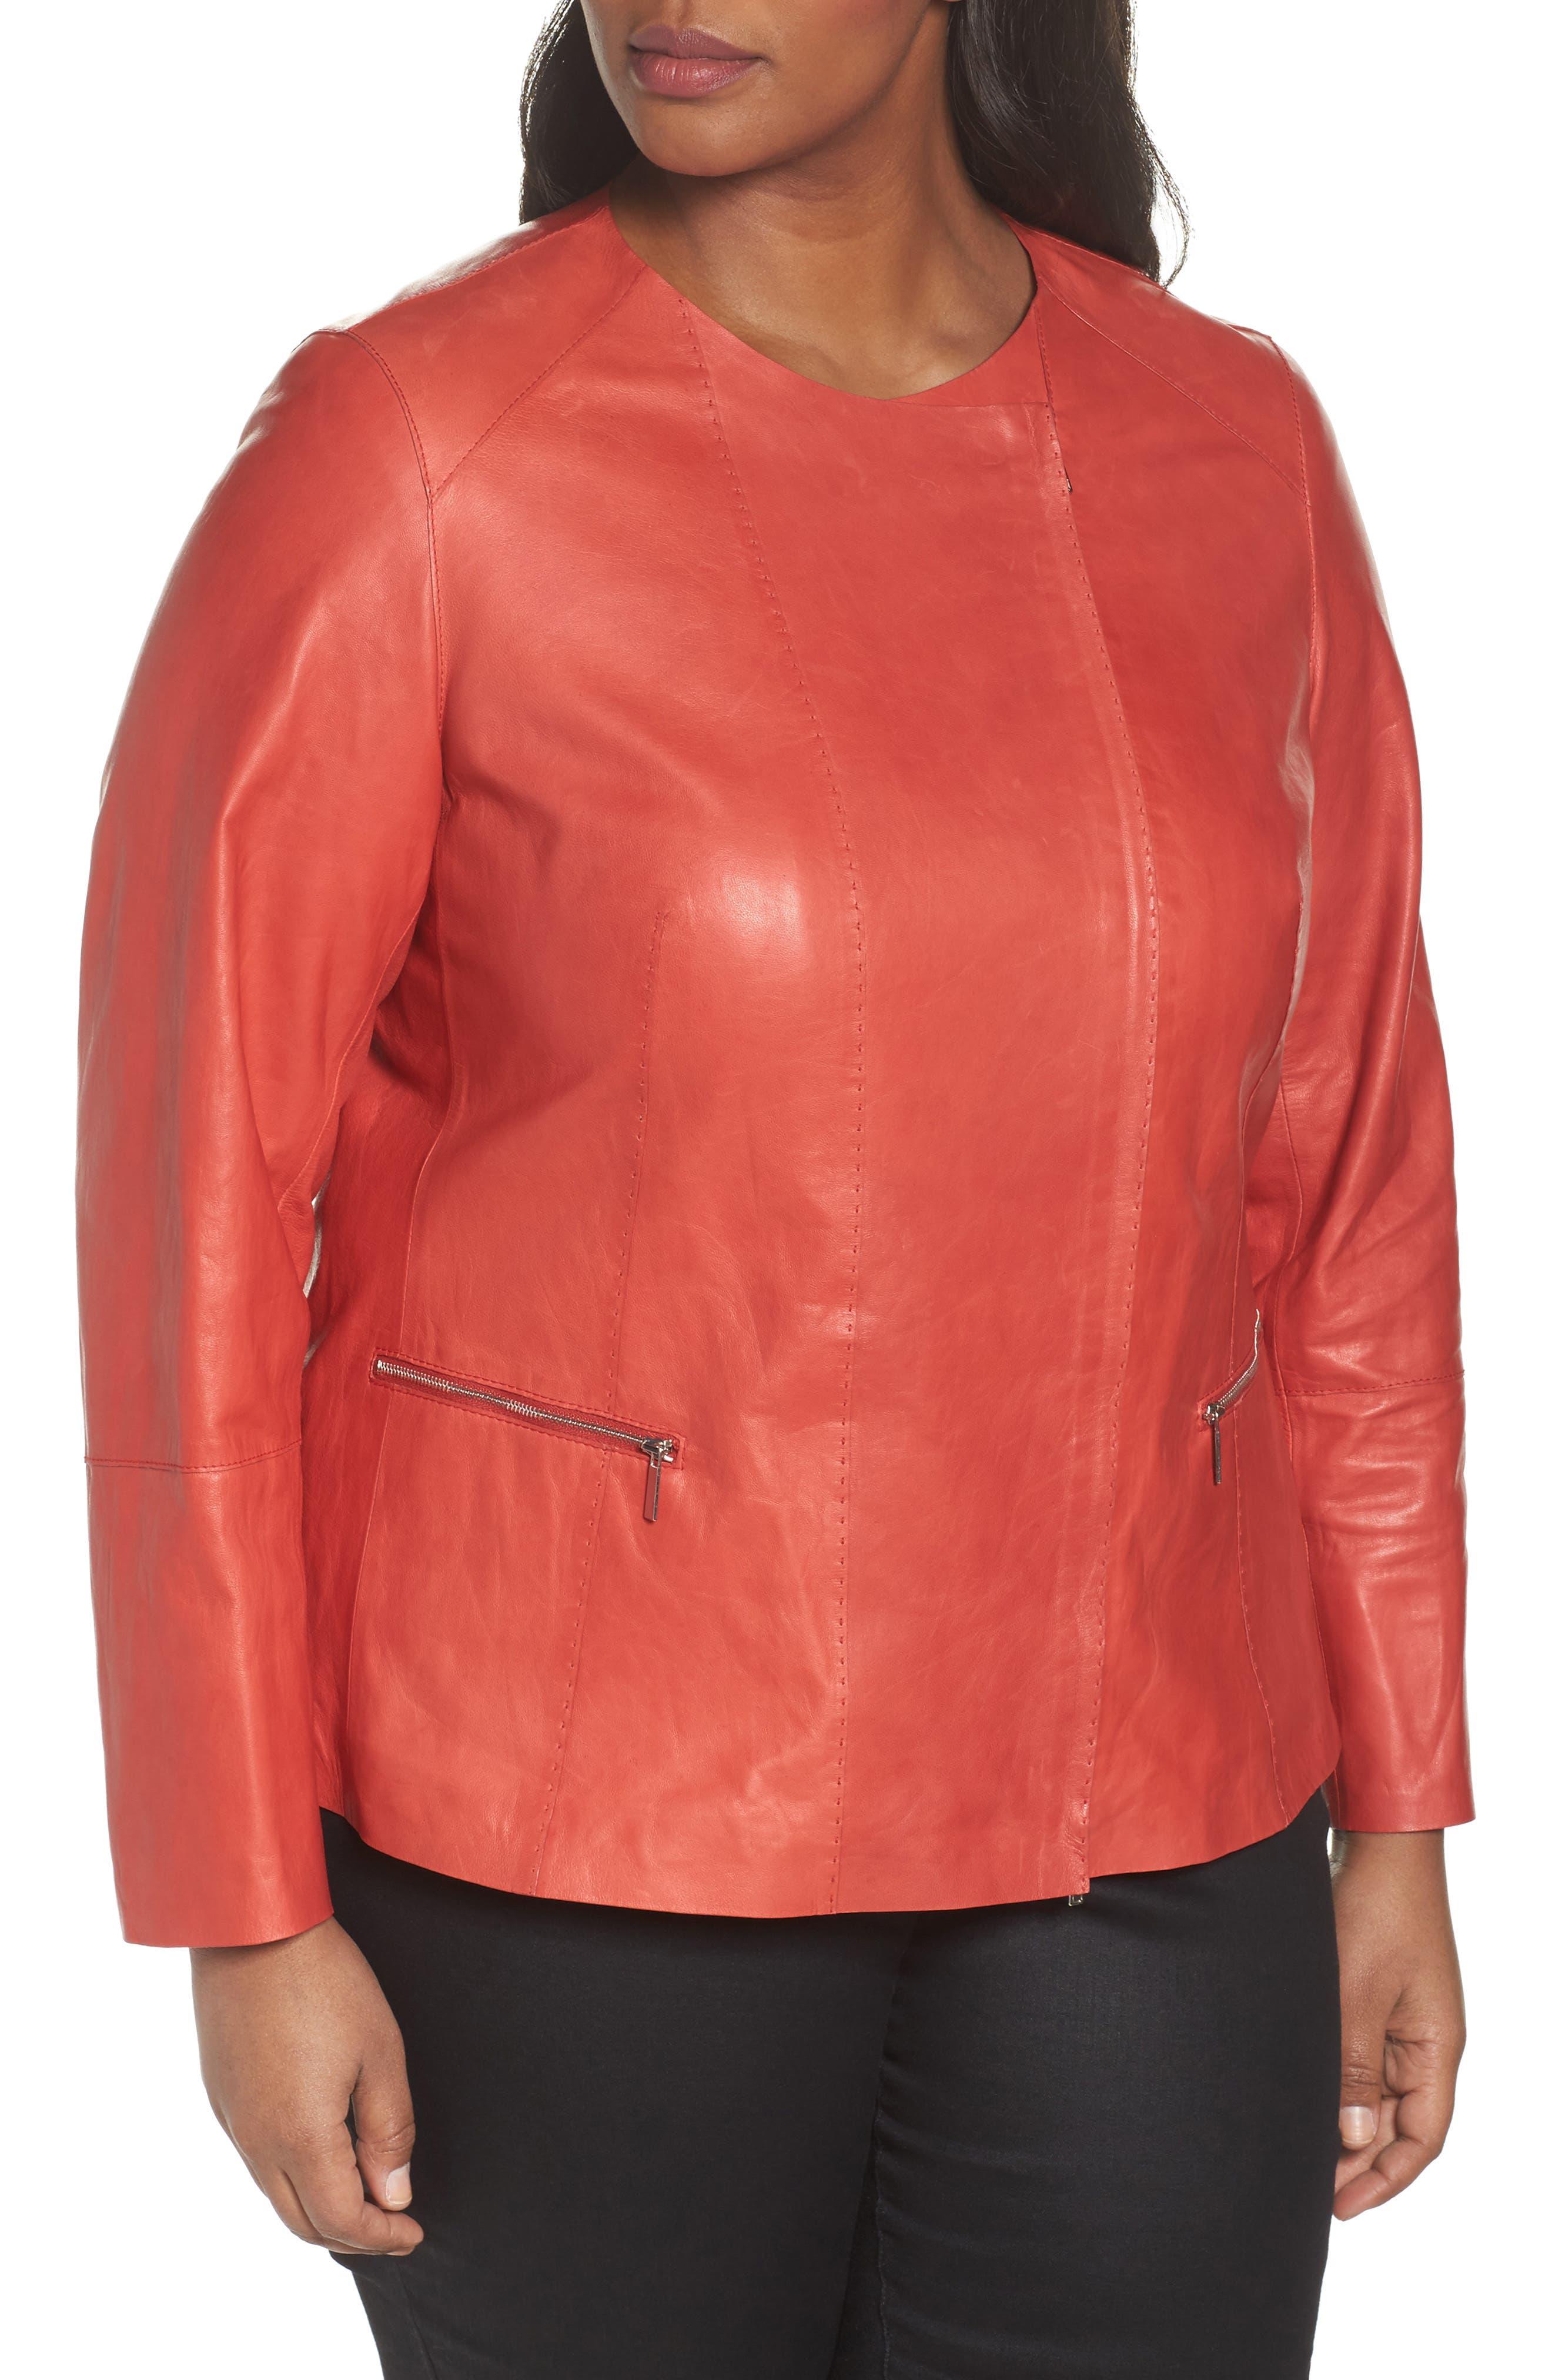 Caridee Glazed Lambskin Leather Jacket,                             Alternate thumbnail 4, color,                             604